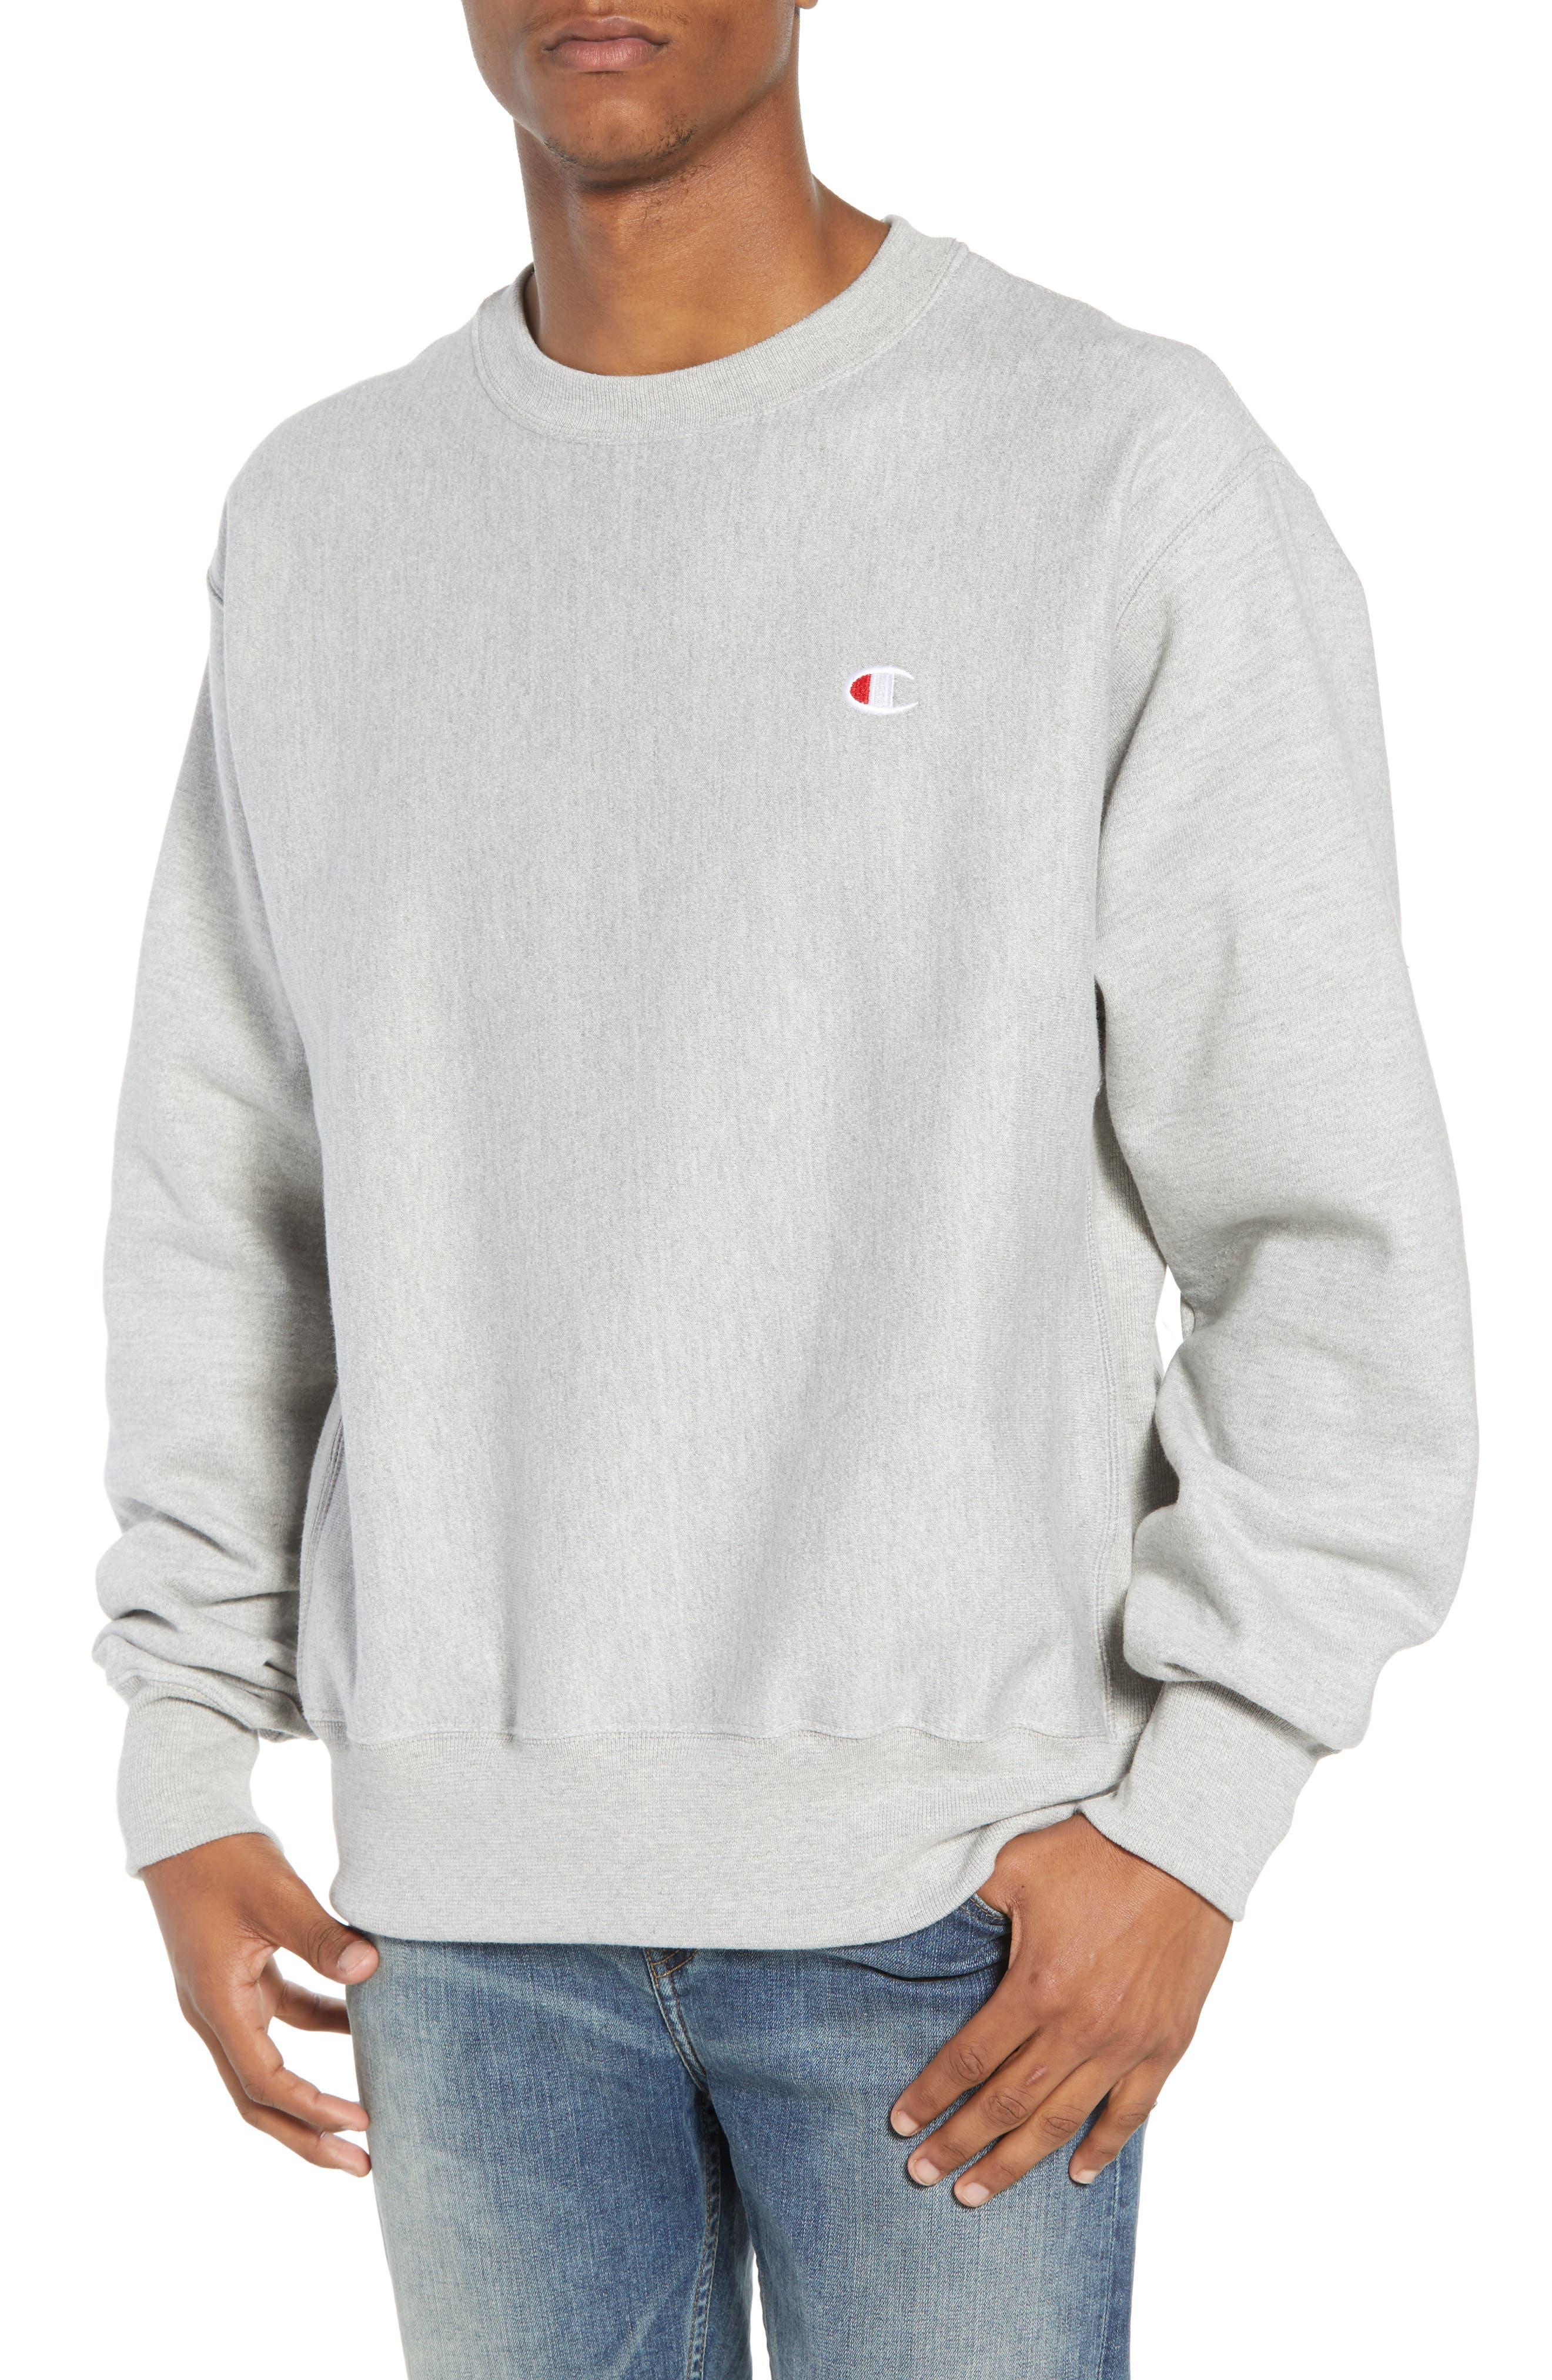 CHAMPION, Reverse Weave Sweatshirt, Main thumbnail 1, color, OXFORD GRAY